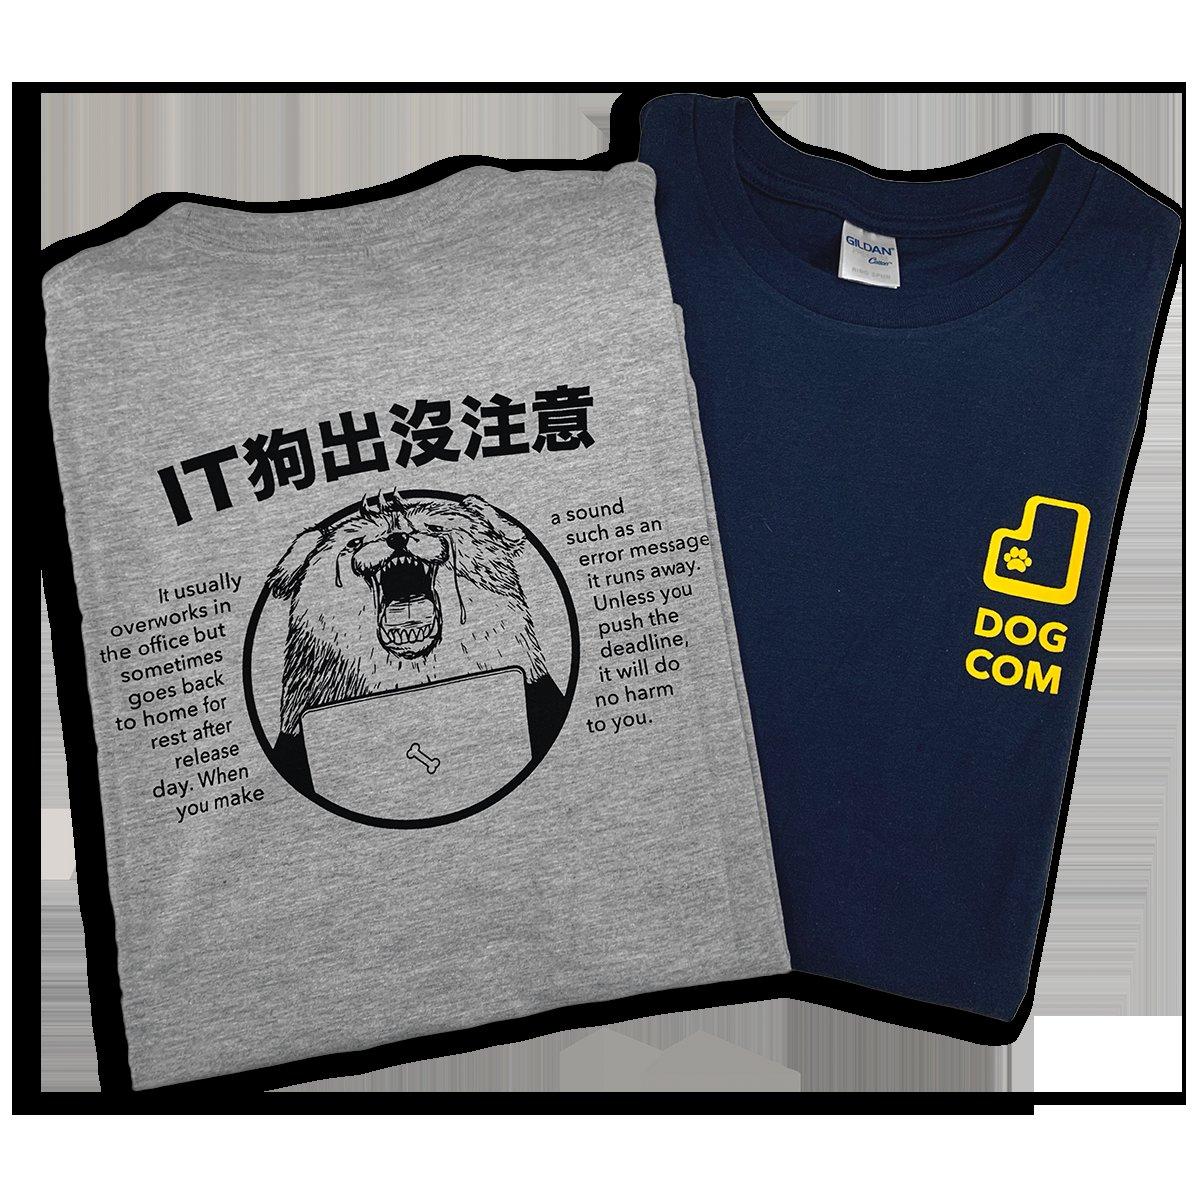 IT狗出沒注意(海軍藍)2XL號-preview-7